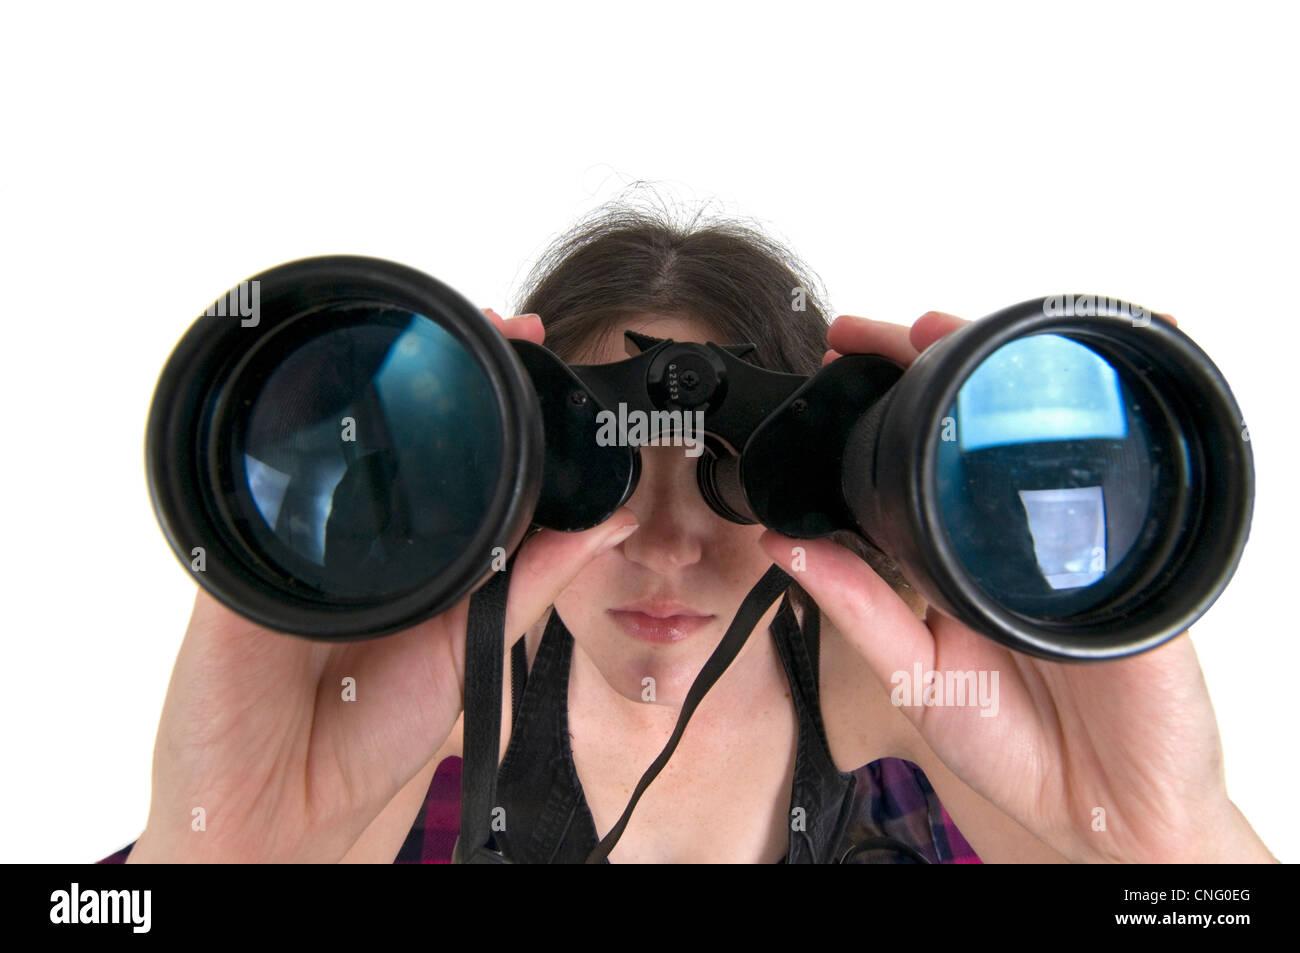 woman with binoculars Stock Photo